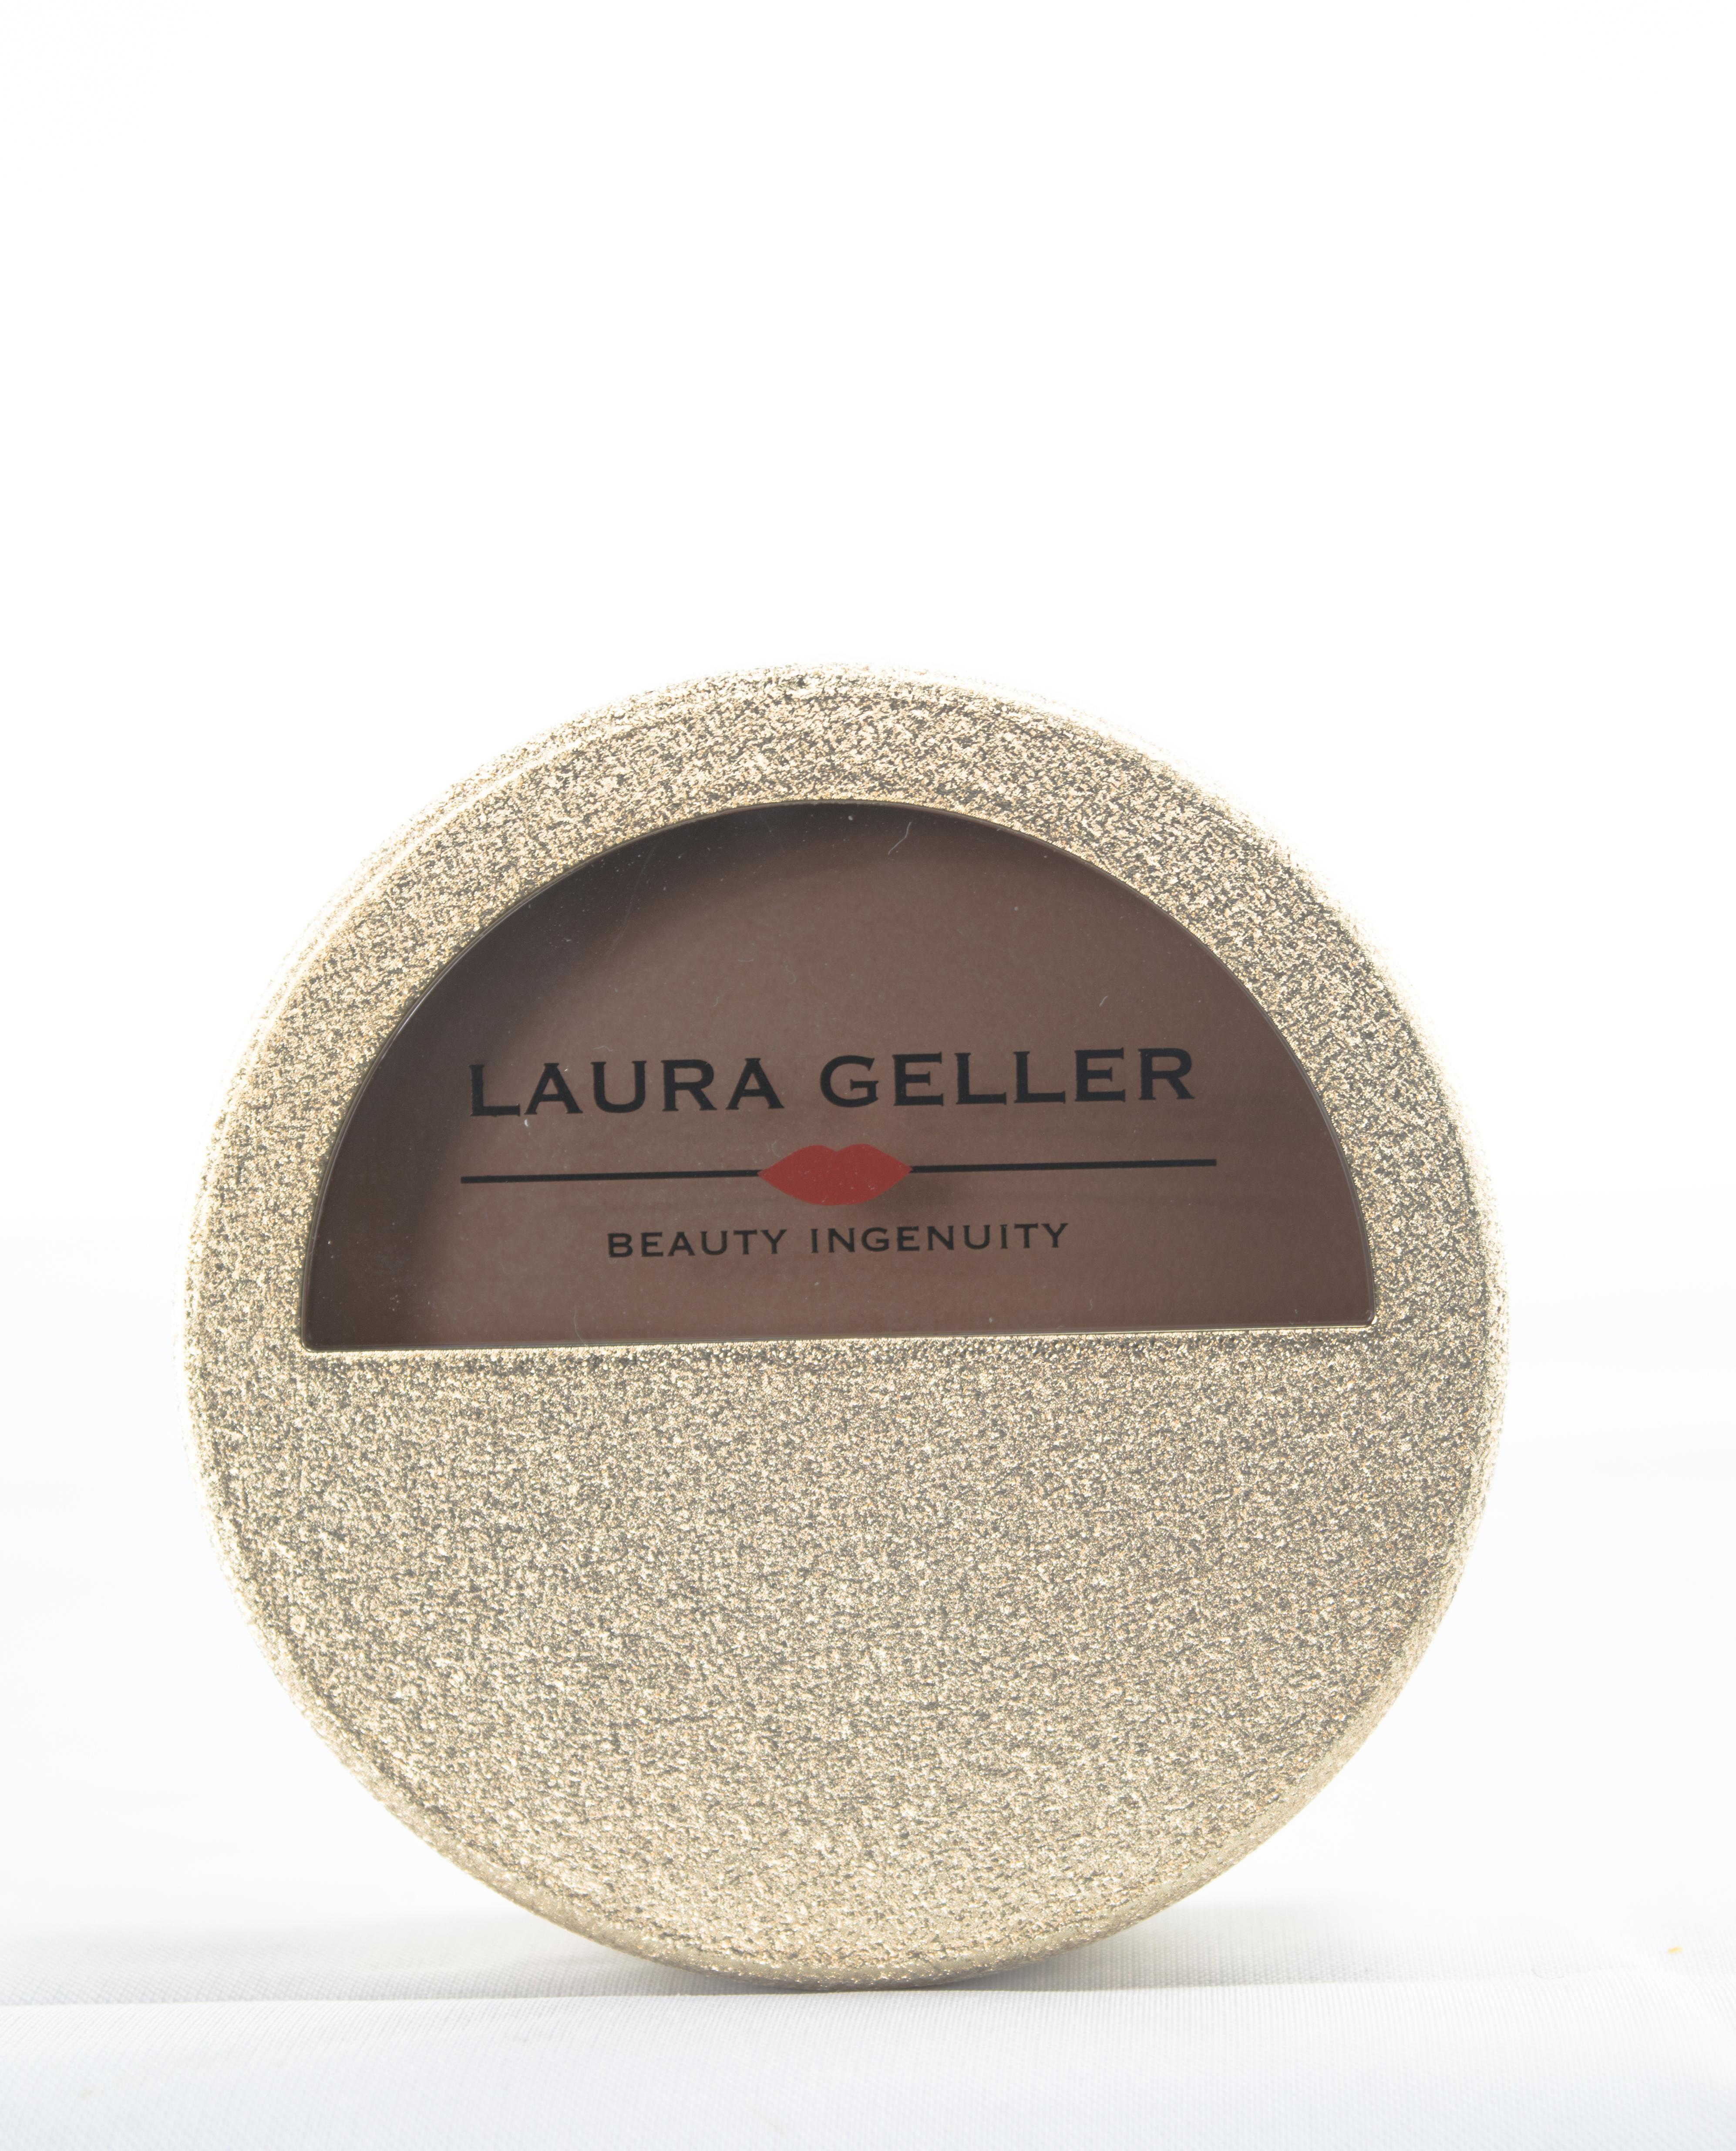 TERRA ILLUMINANTE LAURA GELLER 03